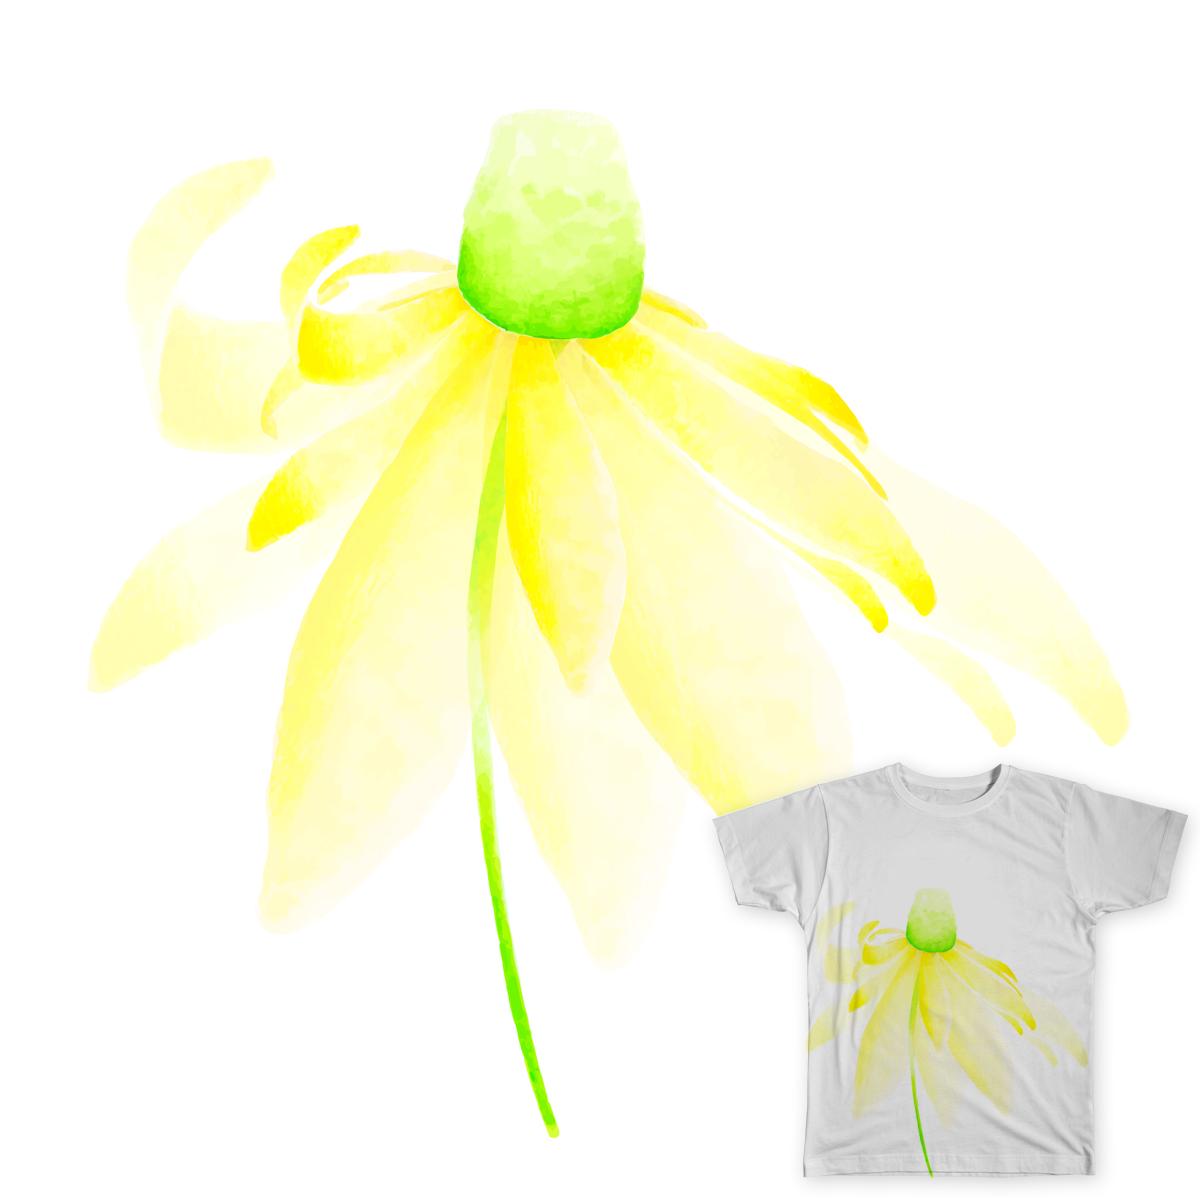 Flower of the sun by crsleigh on Threadless